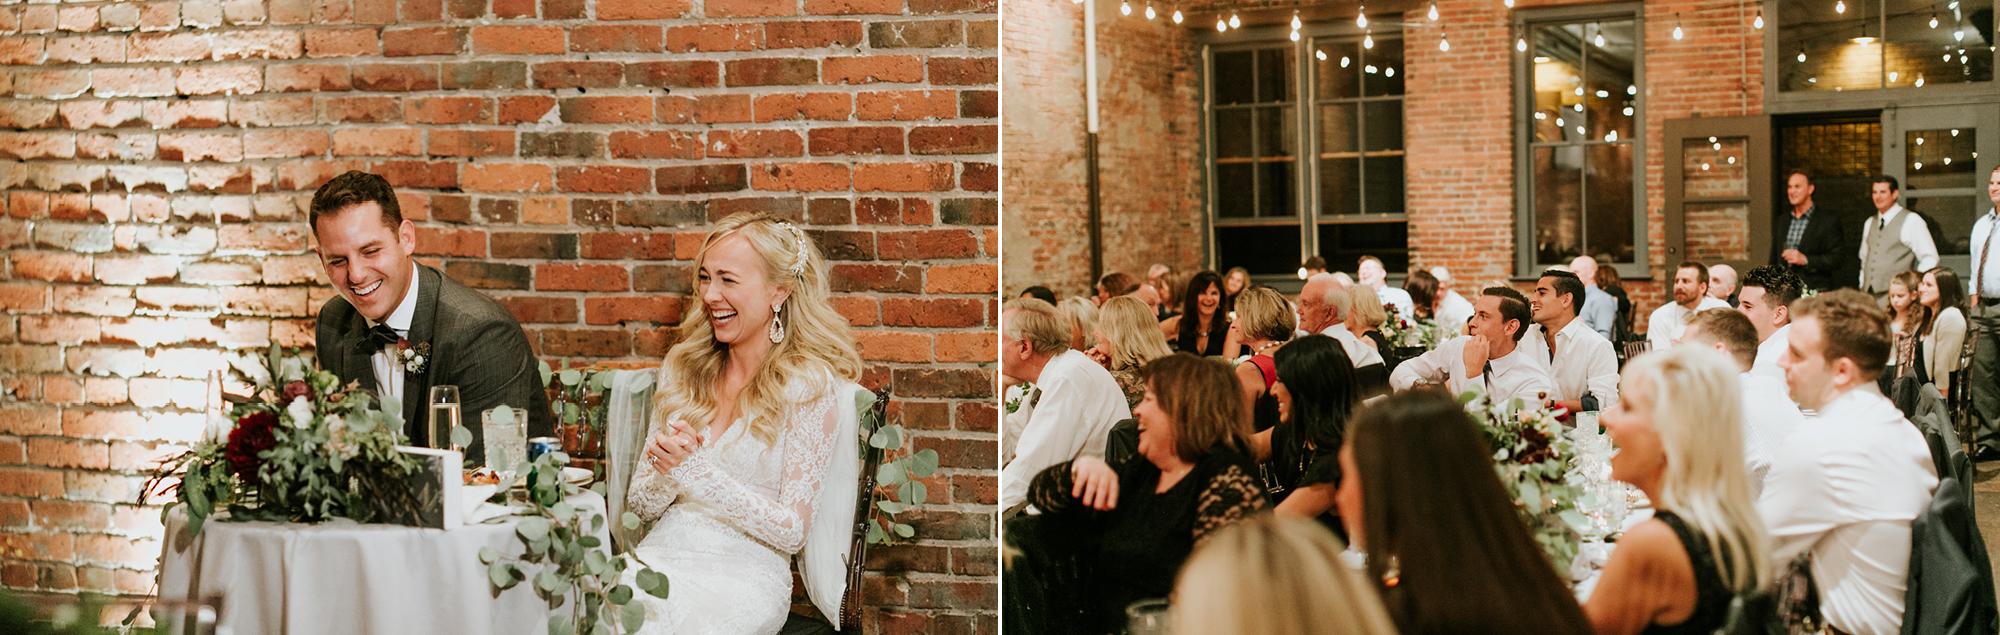 wedding-toasts-seattle3